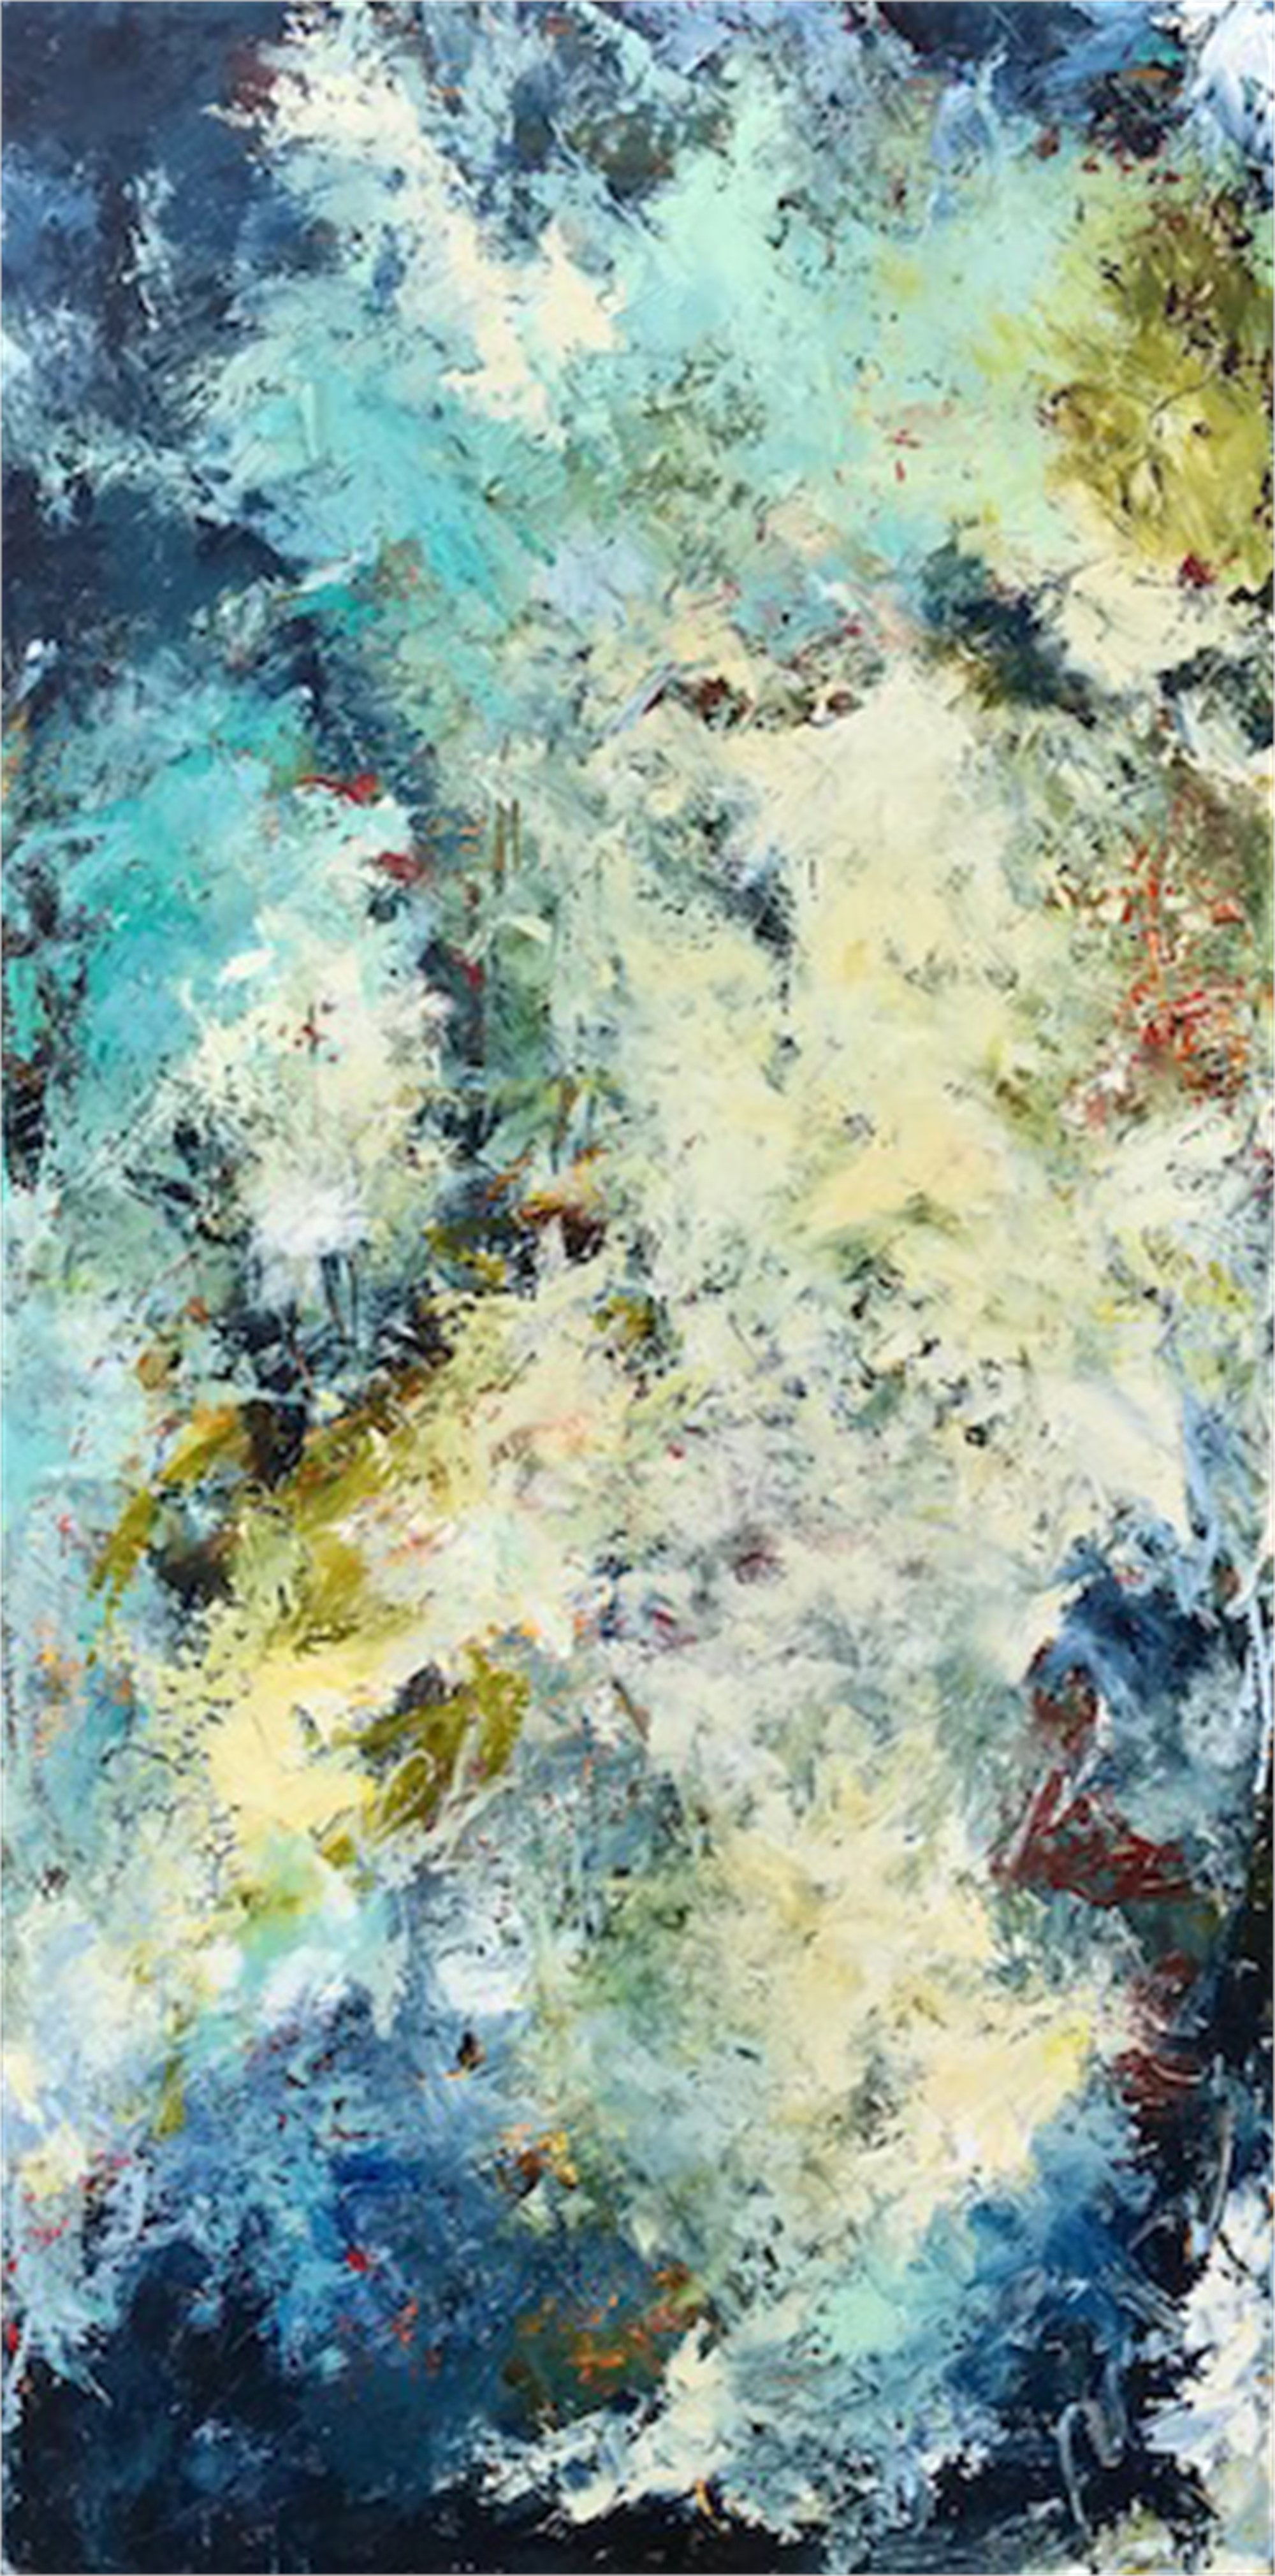 Reaching Deeply by Cindy Walton